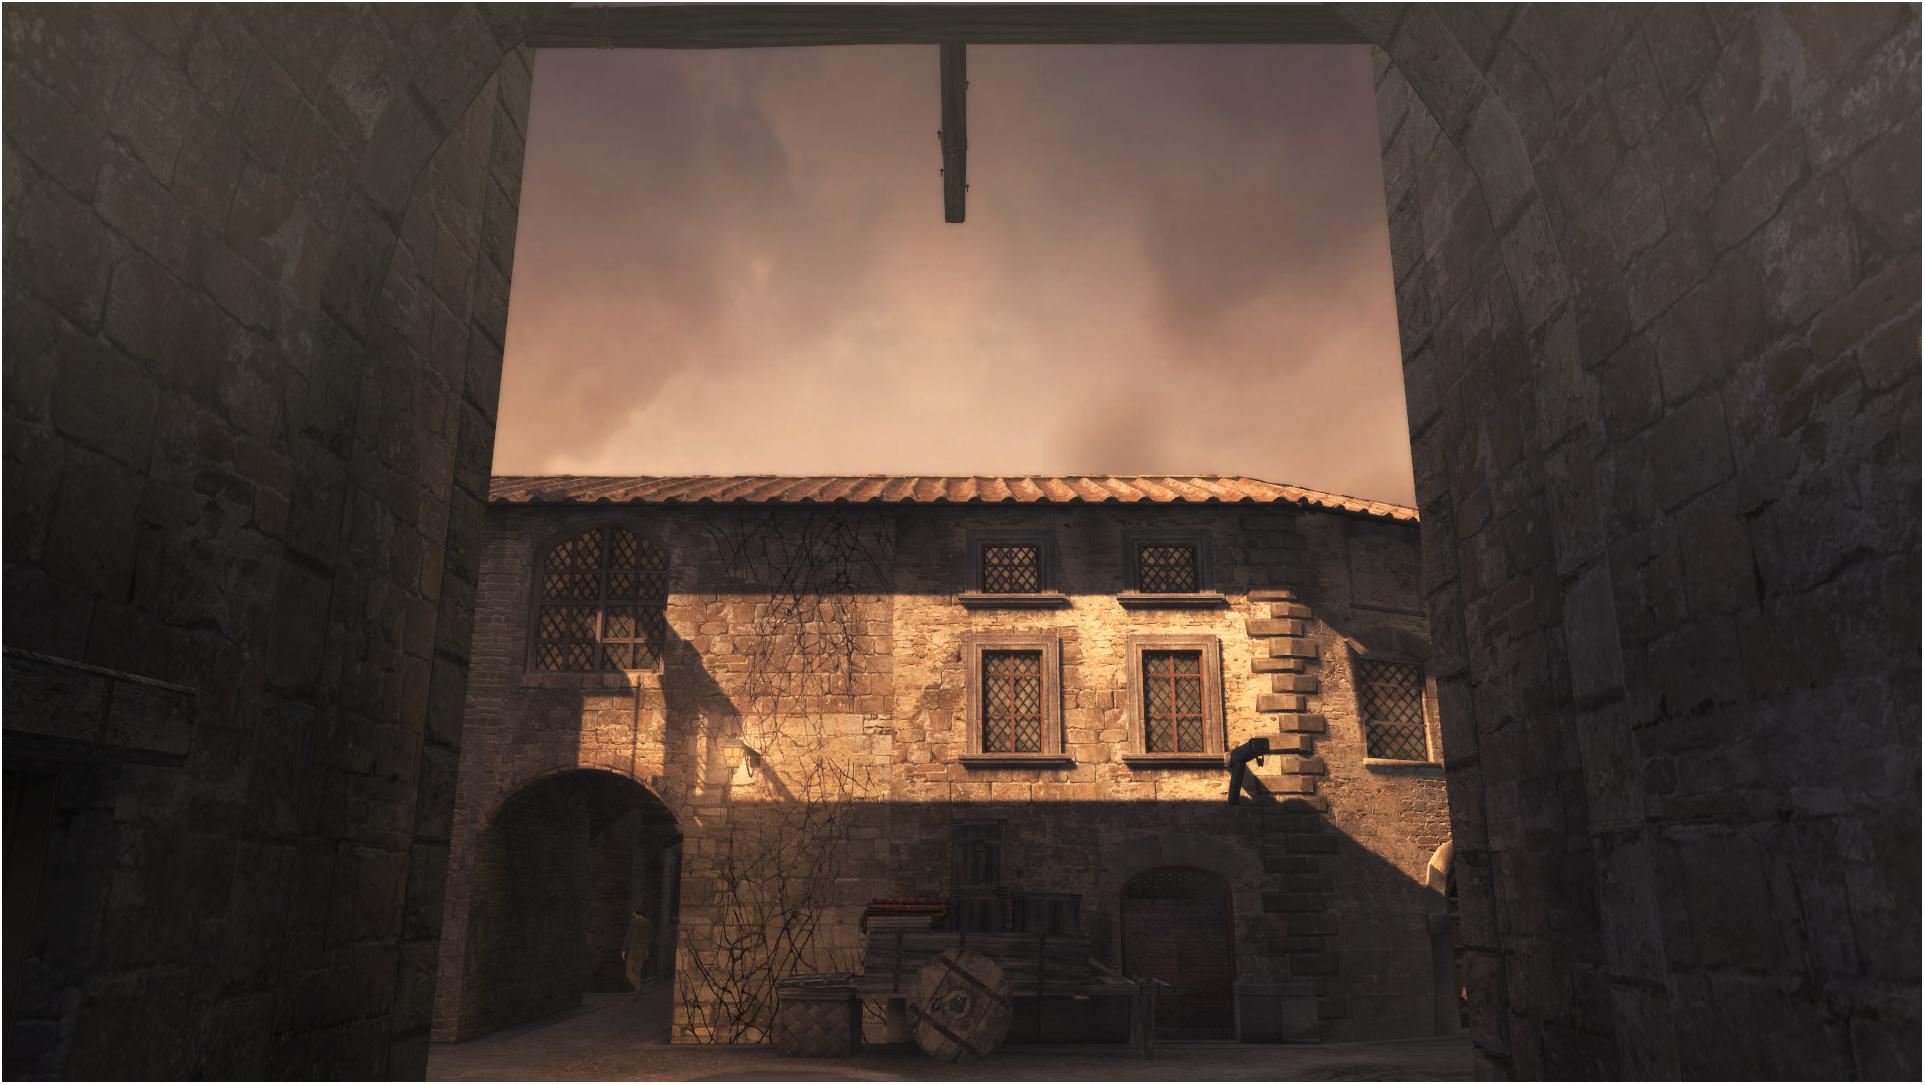 Assassin's Creed Brotherhood_0009_JTC.png